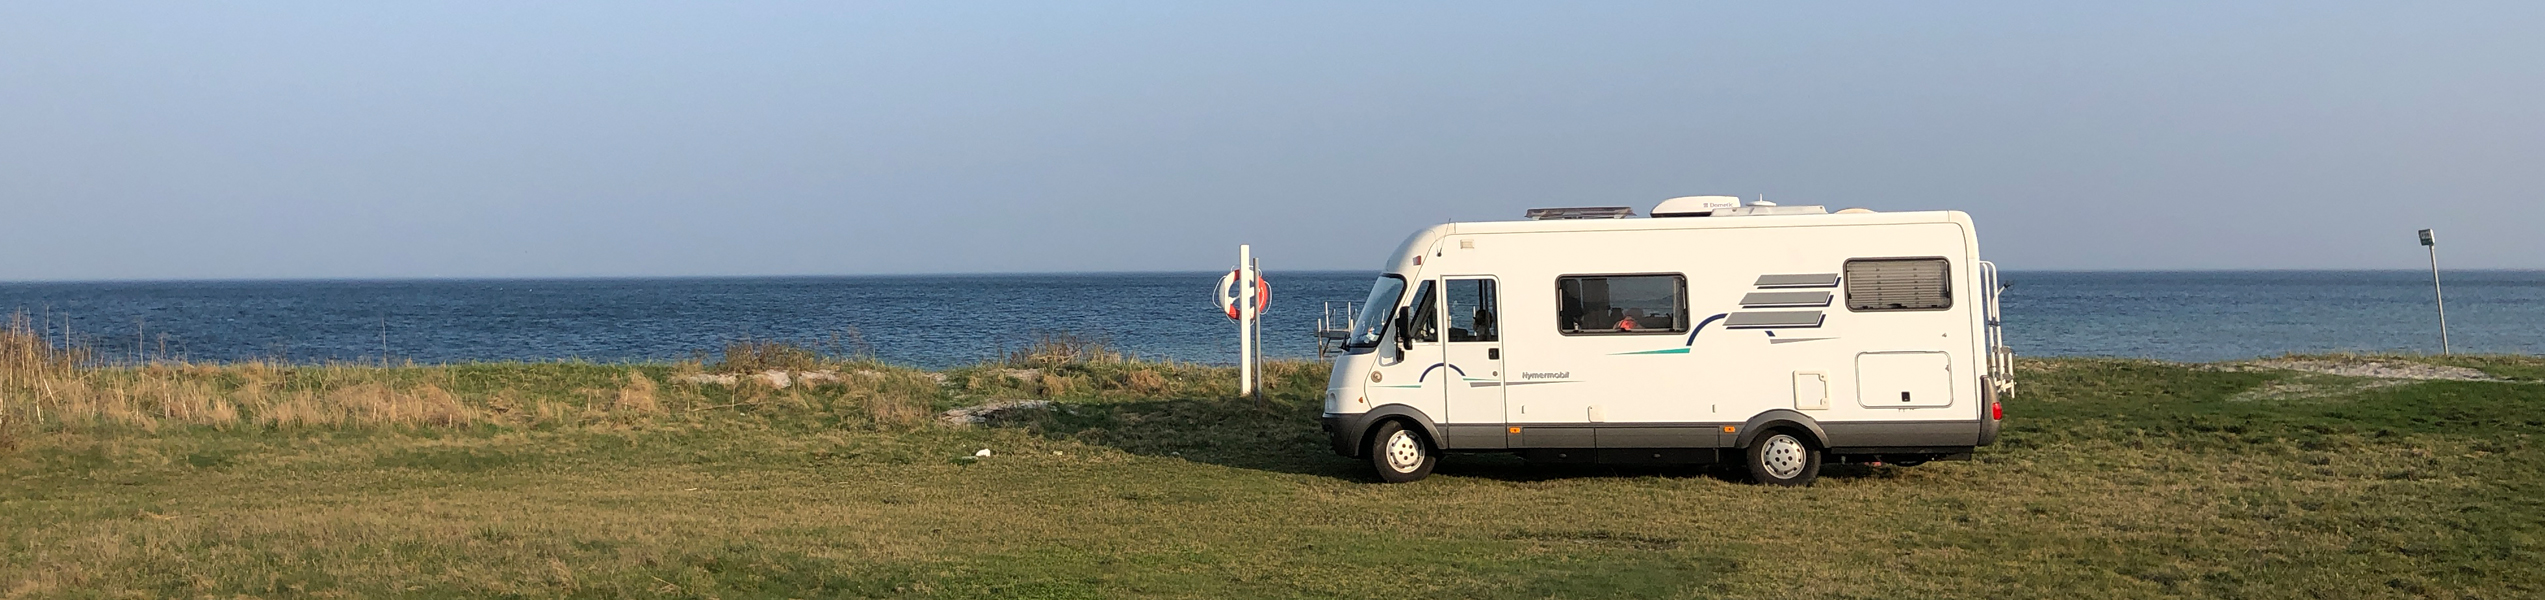 autocamper-campingplads-top